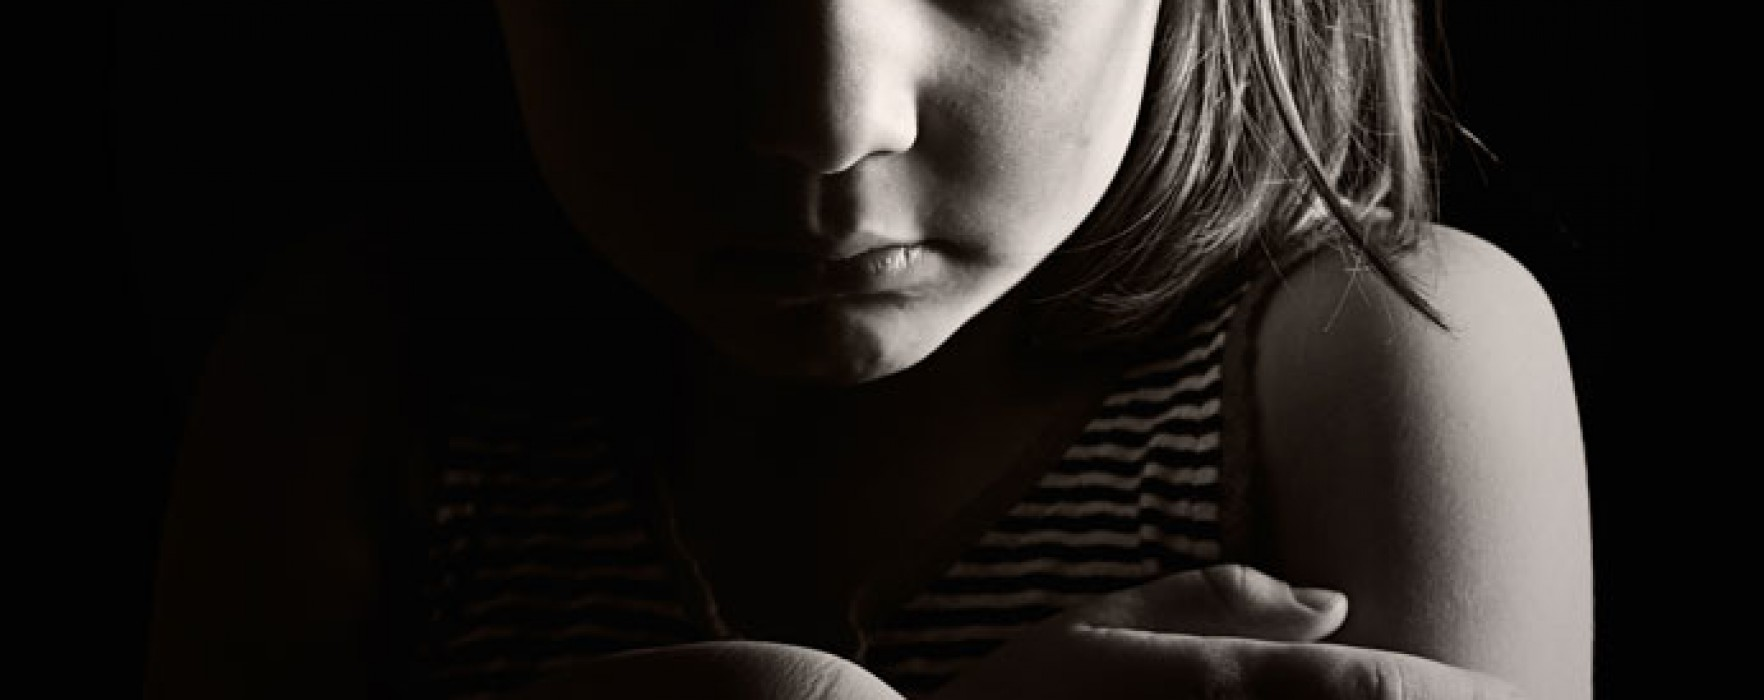 #Safeguarding children - Your responsibility